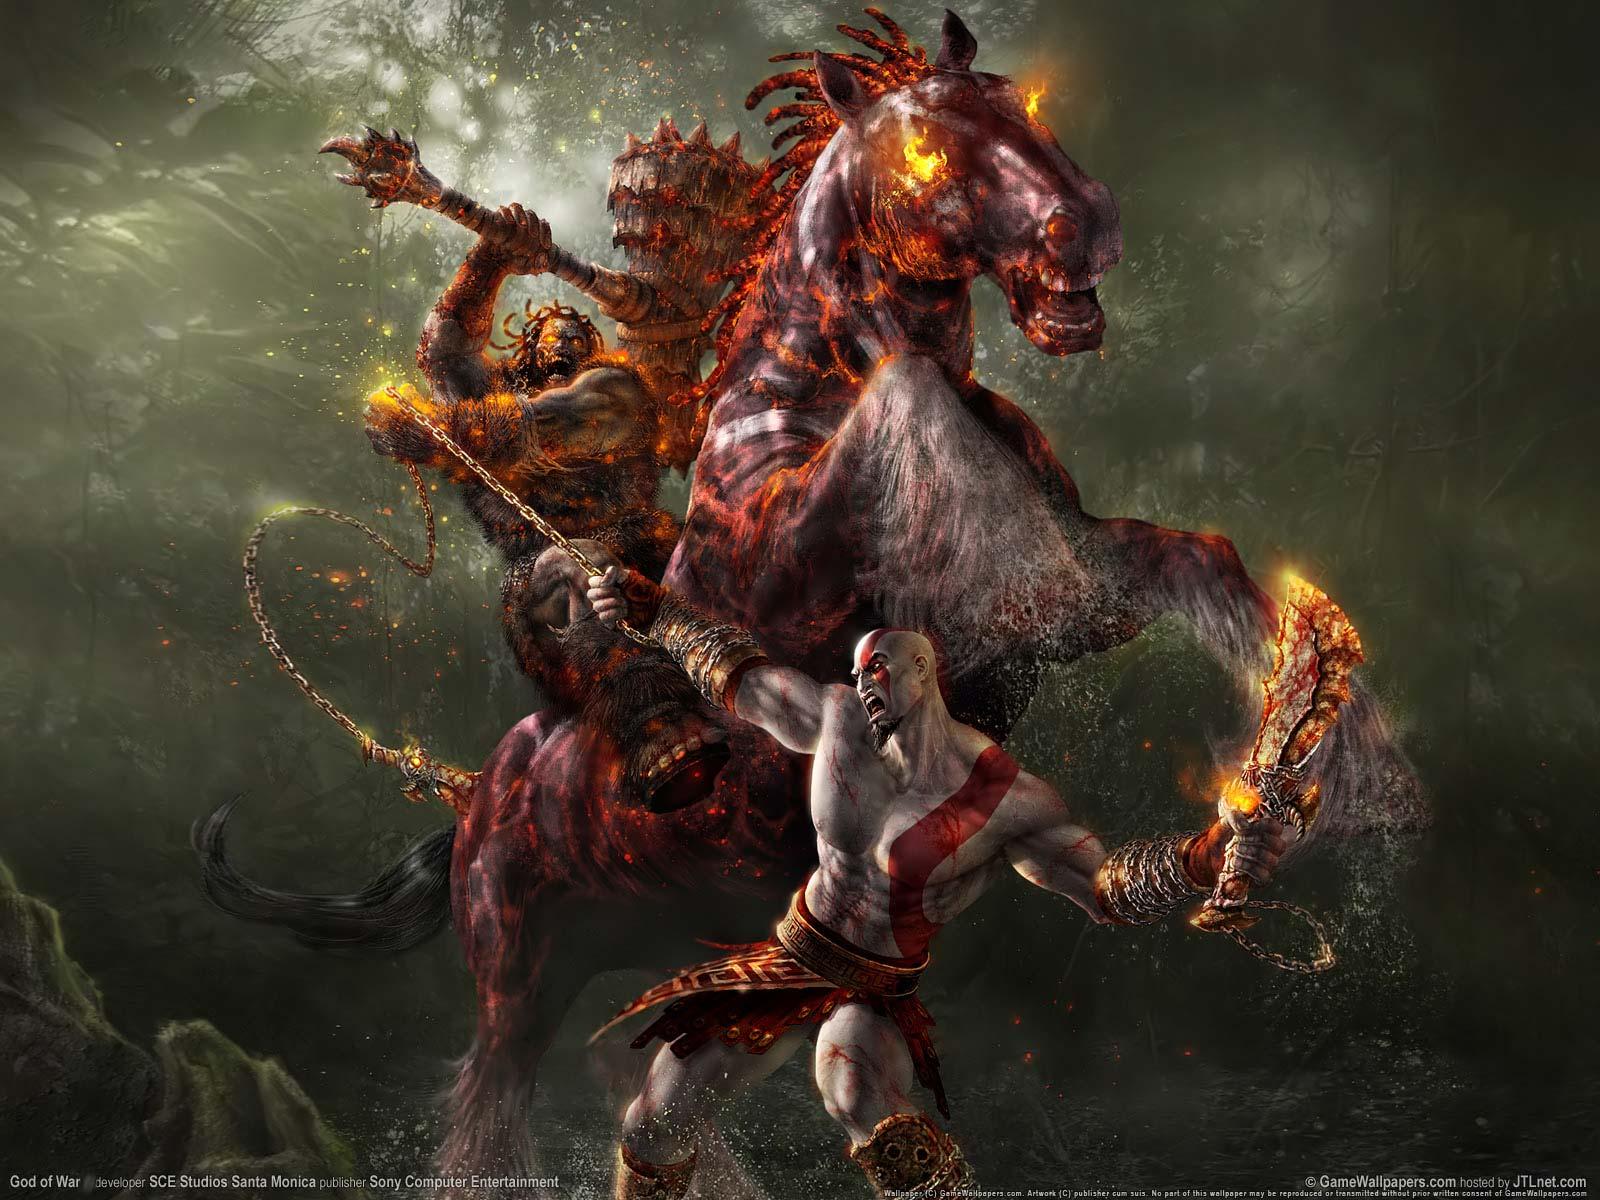 Hd Wallpapers Hd God Of War 3 Wallpaper Of Kratos